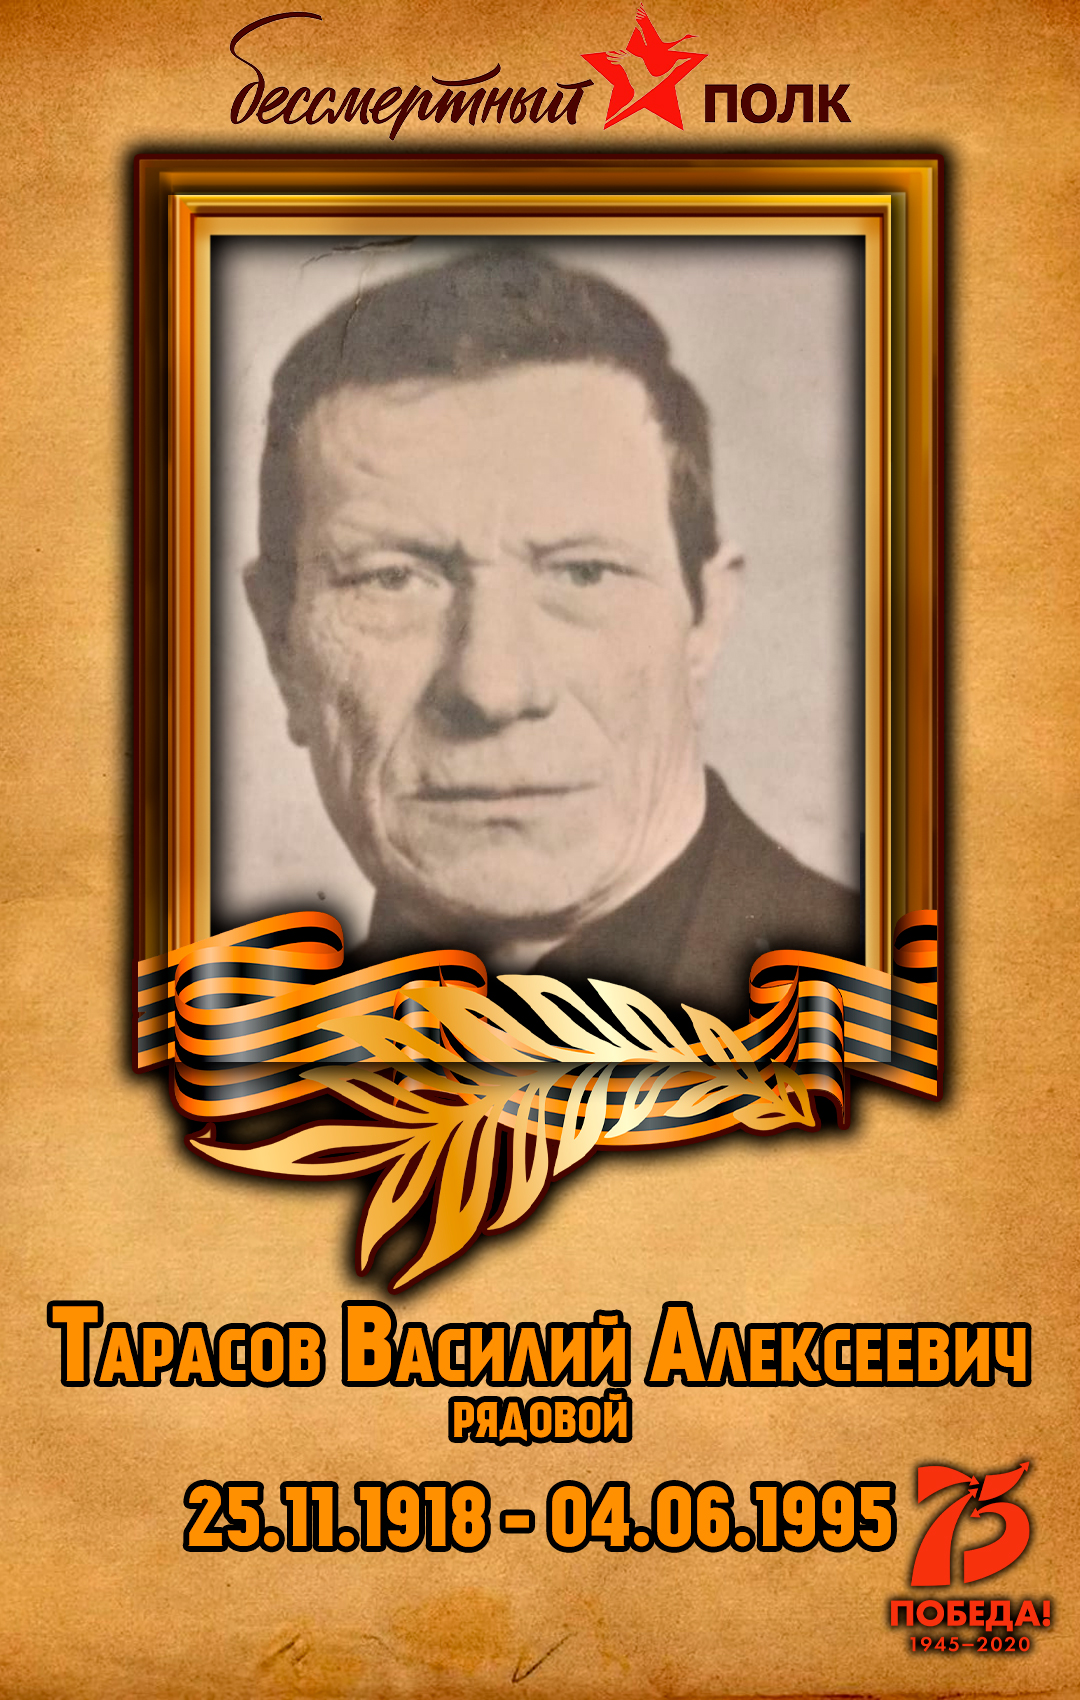 Тарасов-Василий-Алексеевич